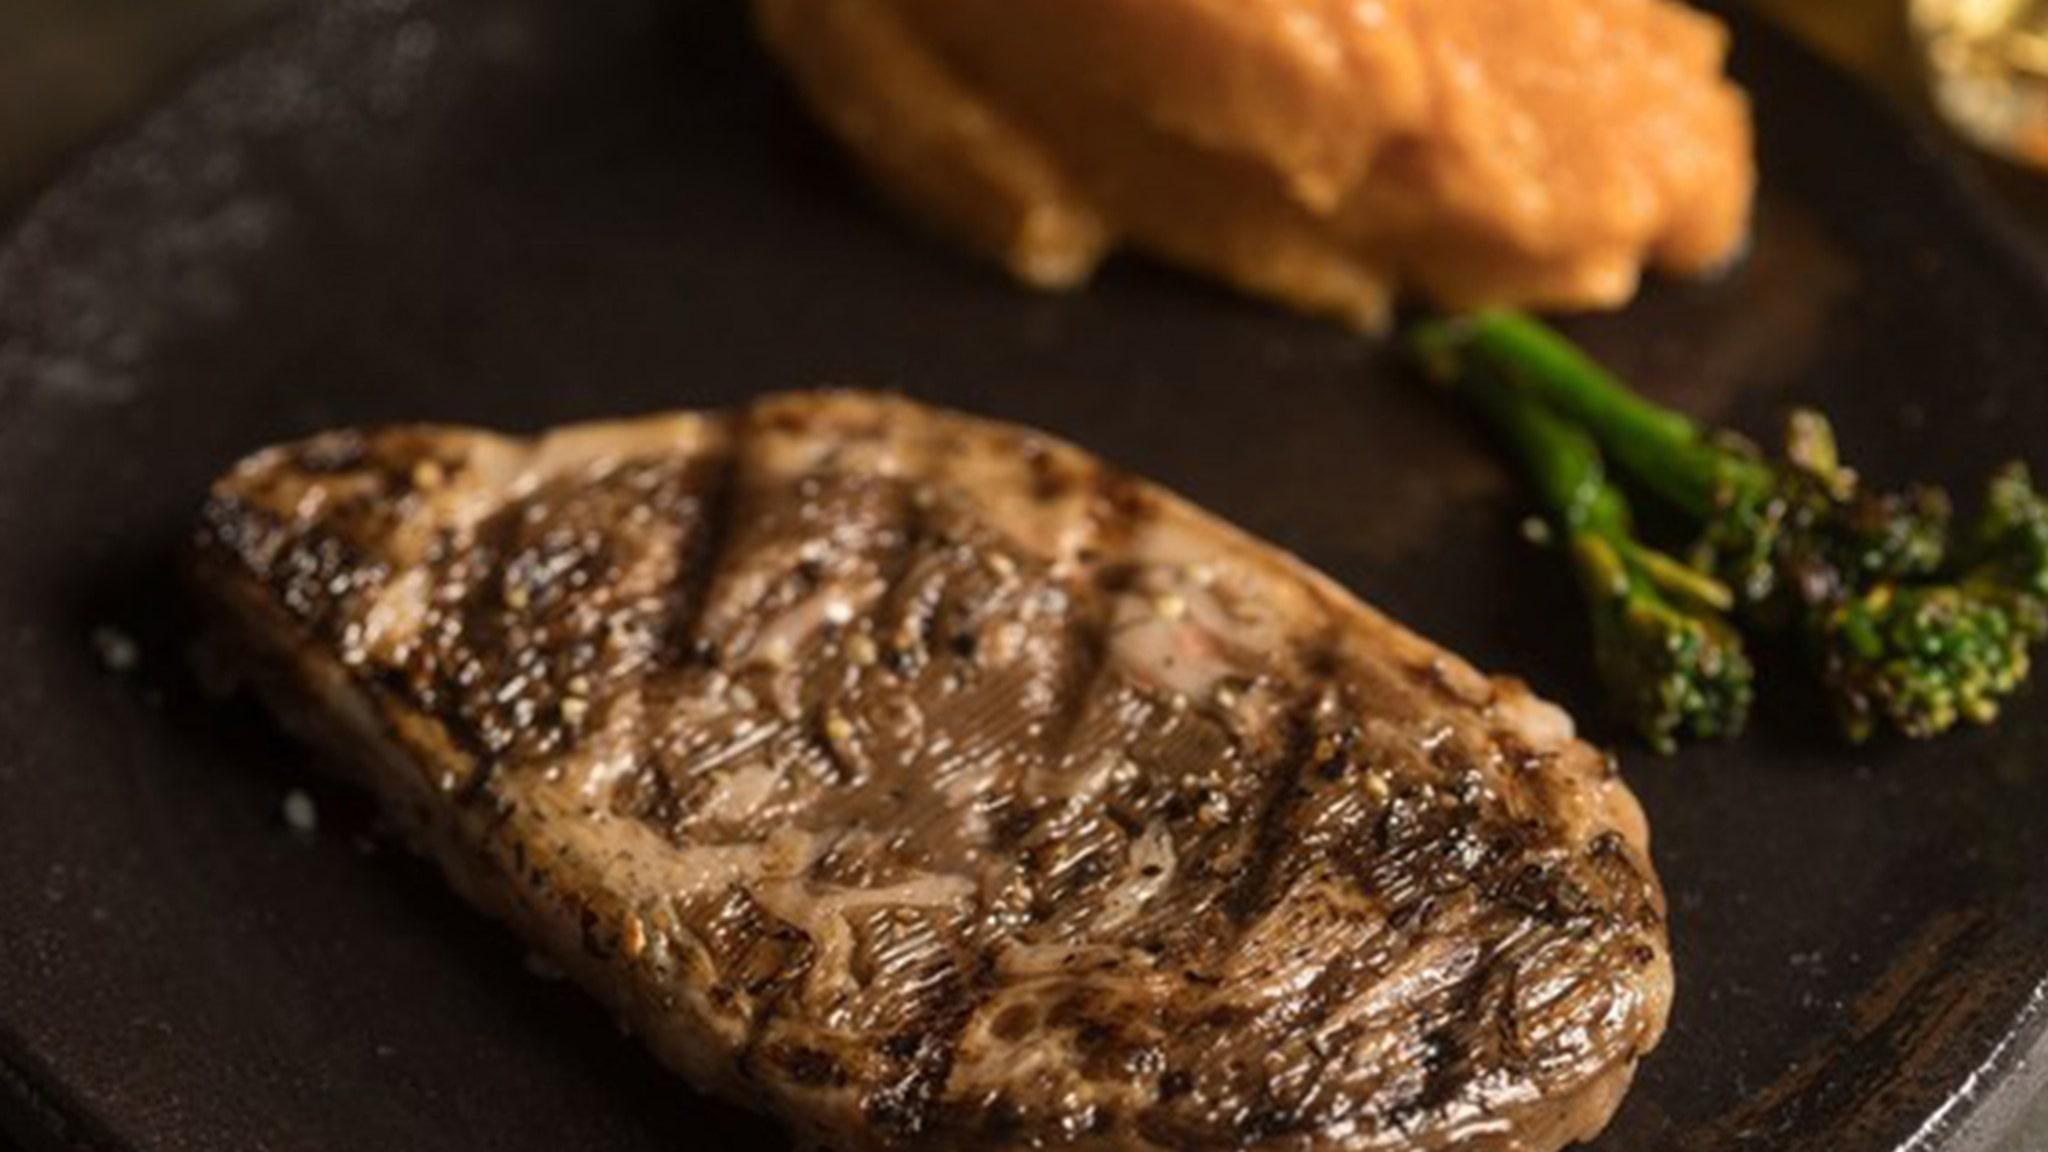 First 3D Bio-Printed Steak Created in Israel, Looks Tasty-ish? - TMZ